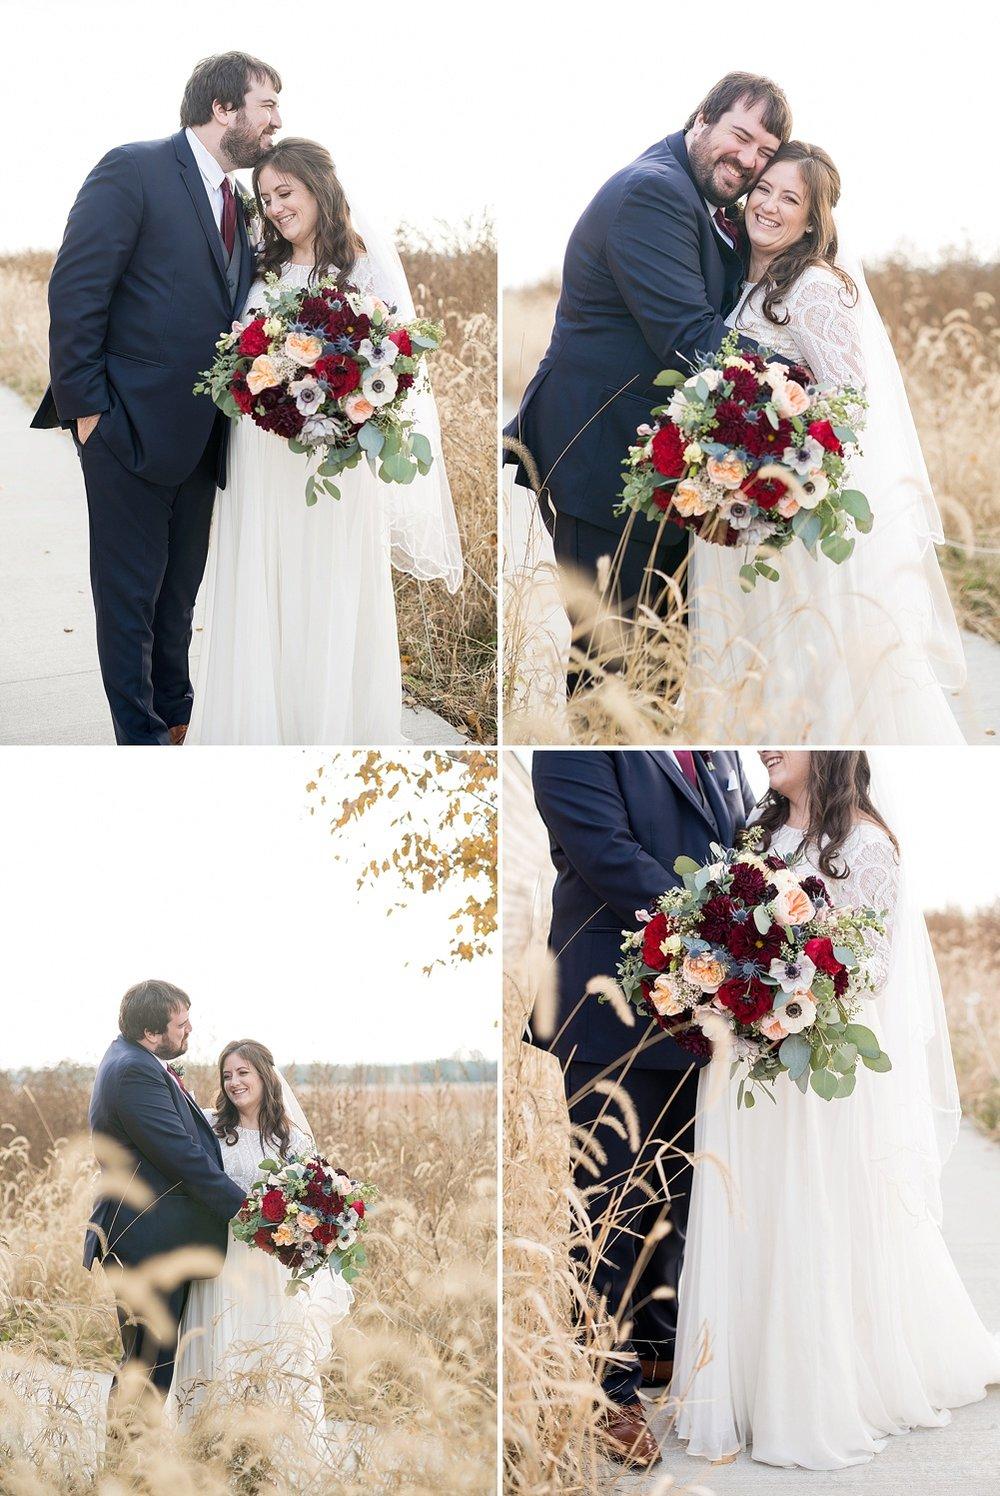 Bluestem-Hall-Urbana-Prairie-Restoration-fall-wedding_4113.jpg